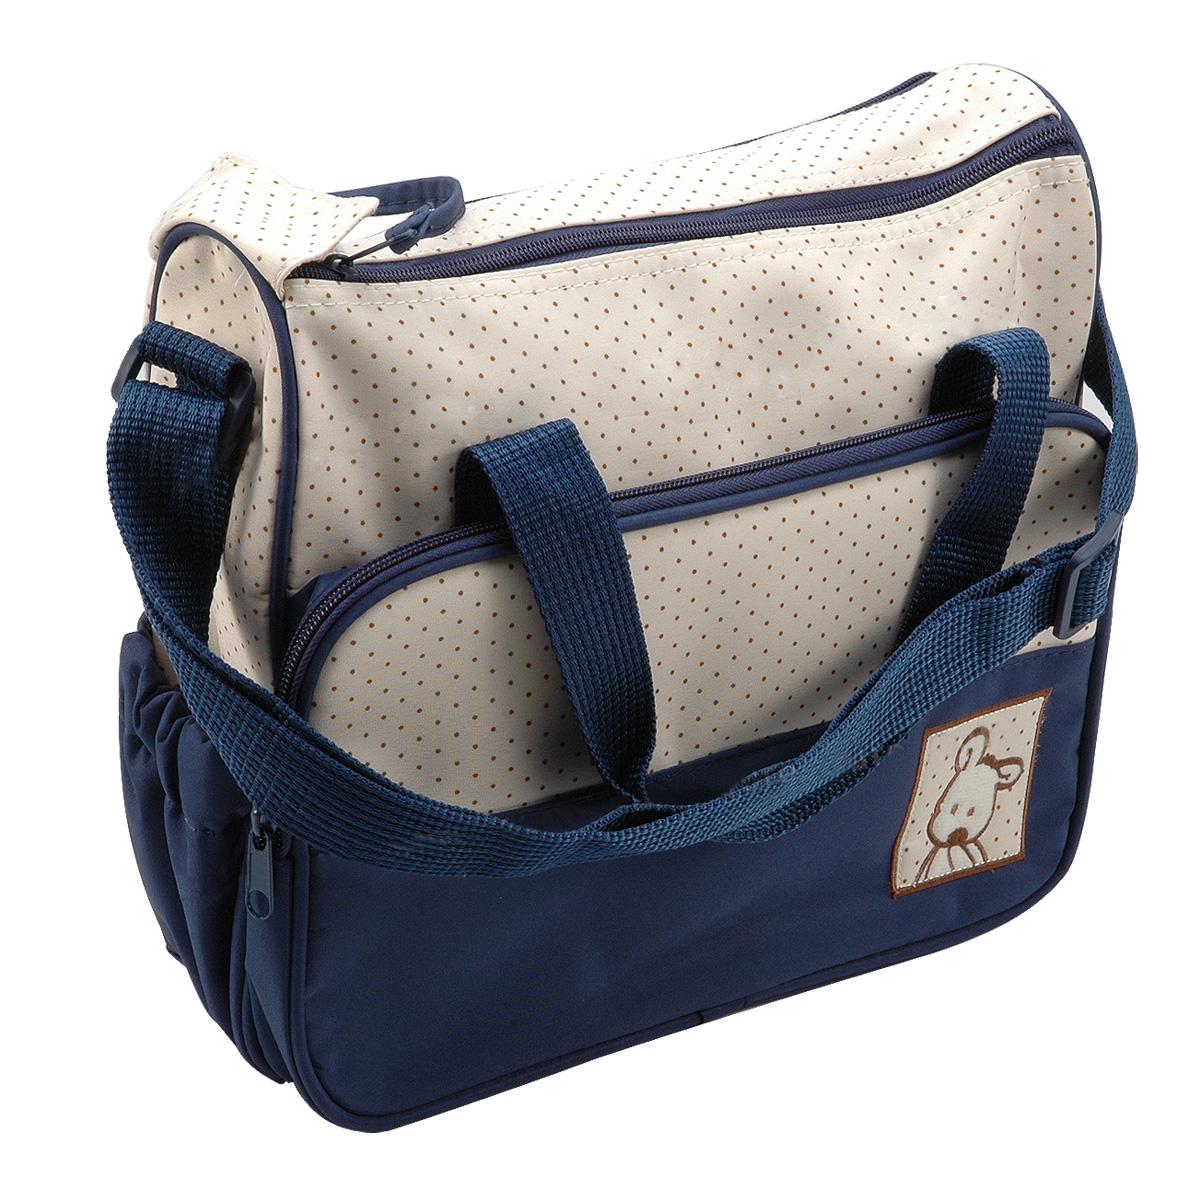 sac a bebe bleu sac interieur exterieur sac repas et sac biberon couche wt ebay. Black Bedroom Furniture Sets. Home Design Ideas